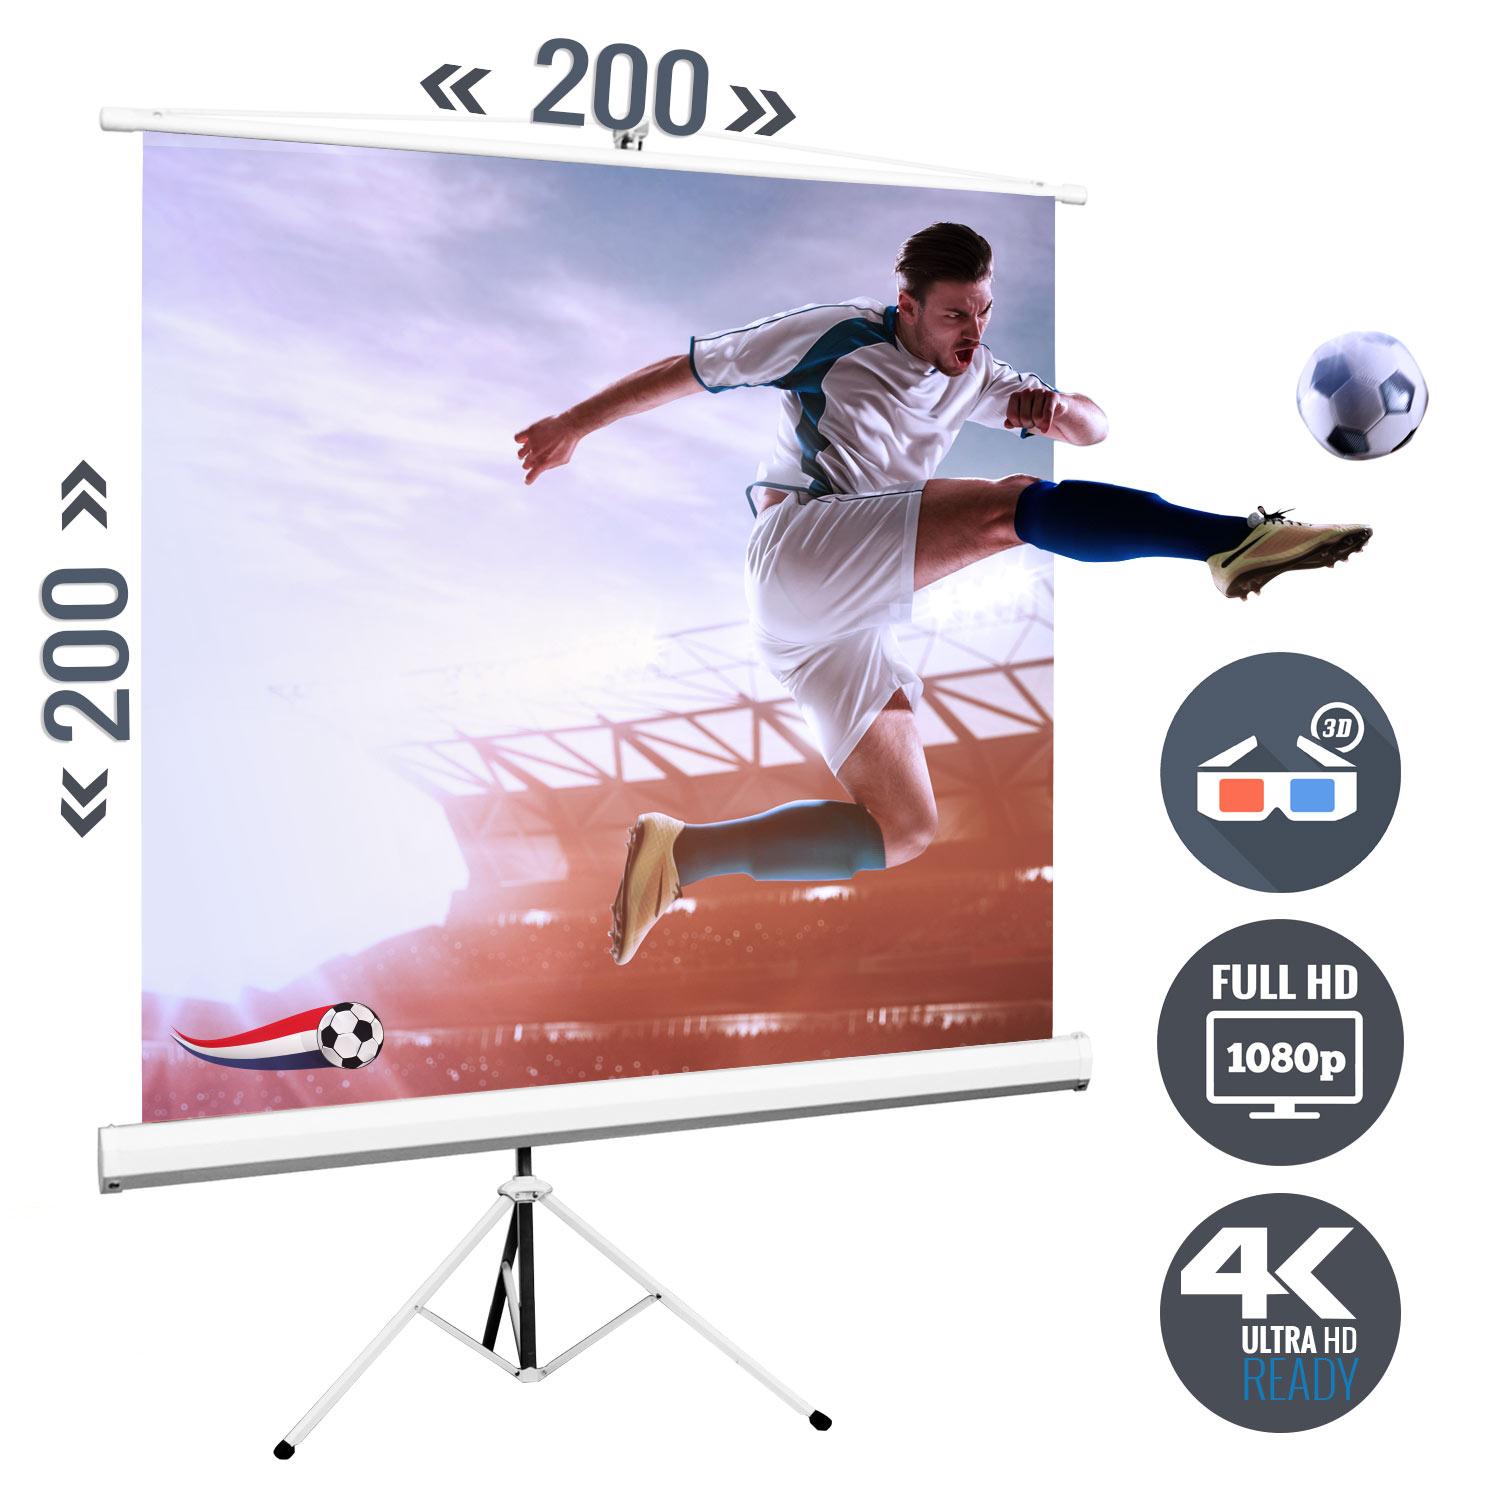 Stativ Beamer Leinwand 200x200 cm